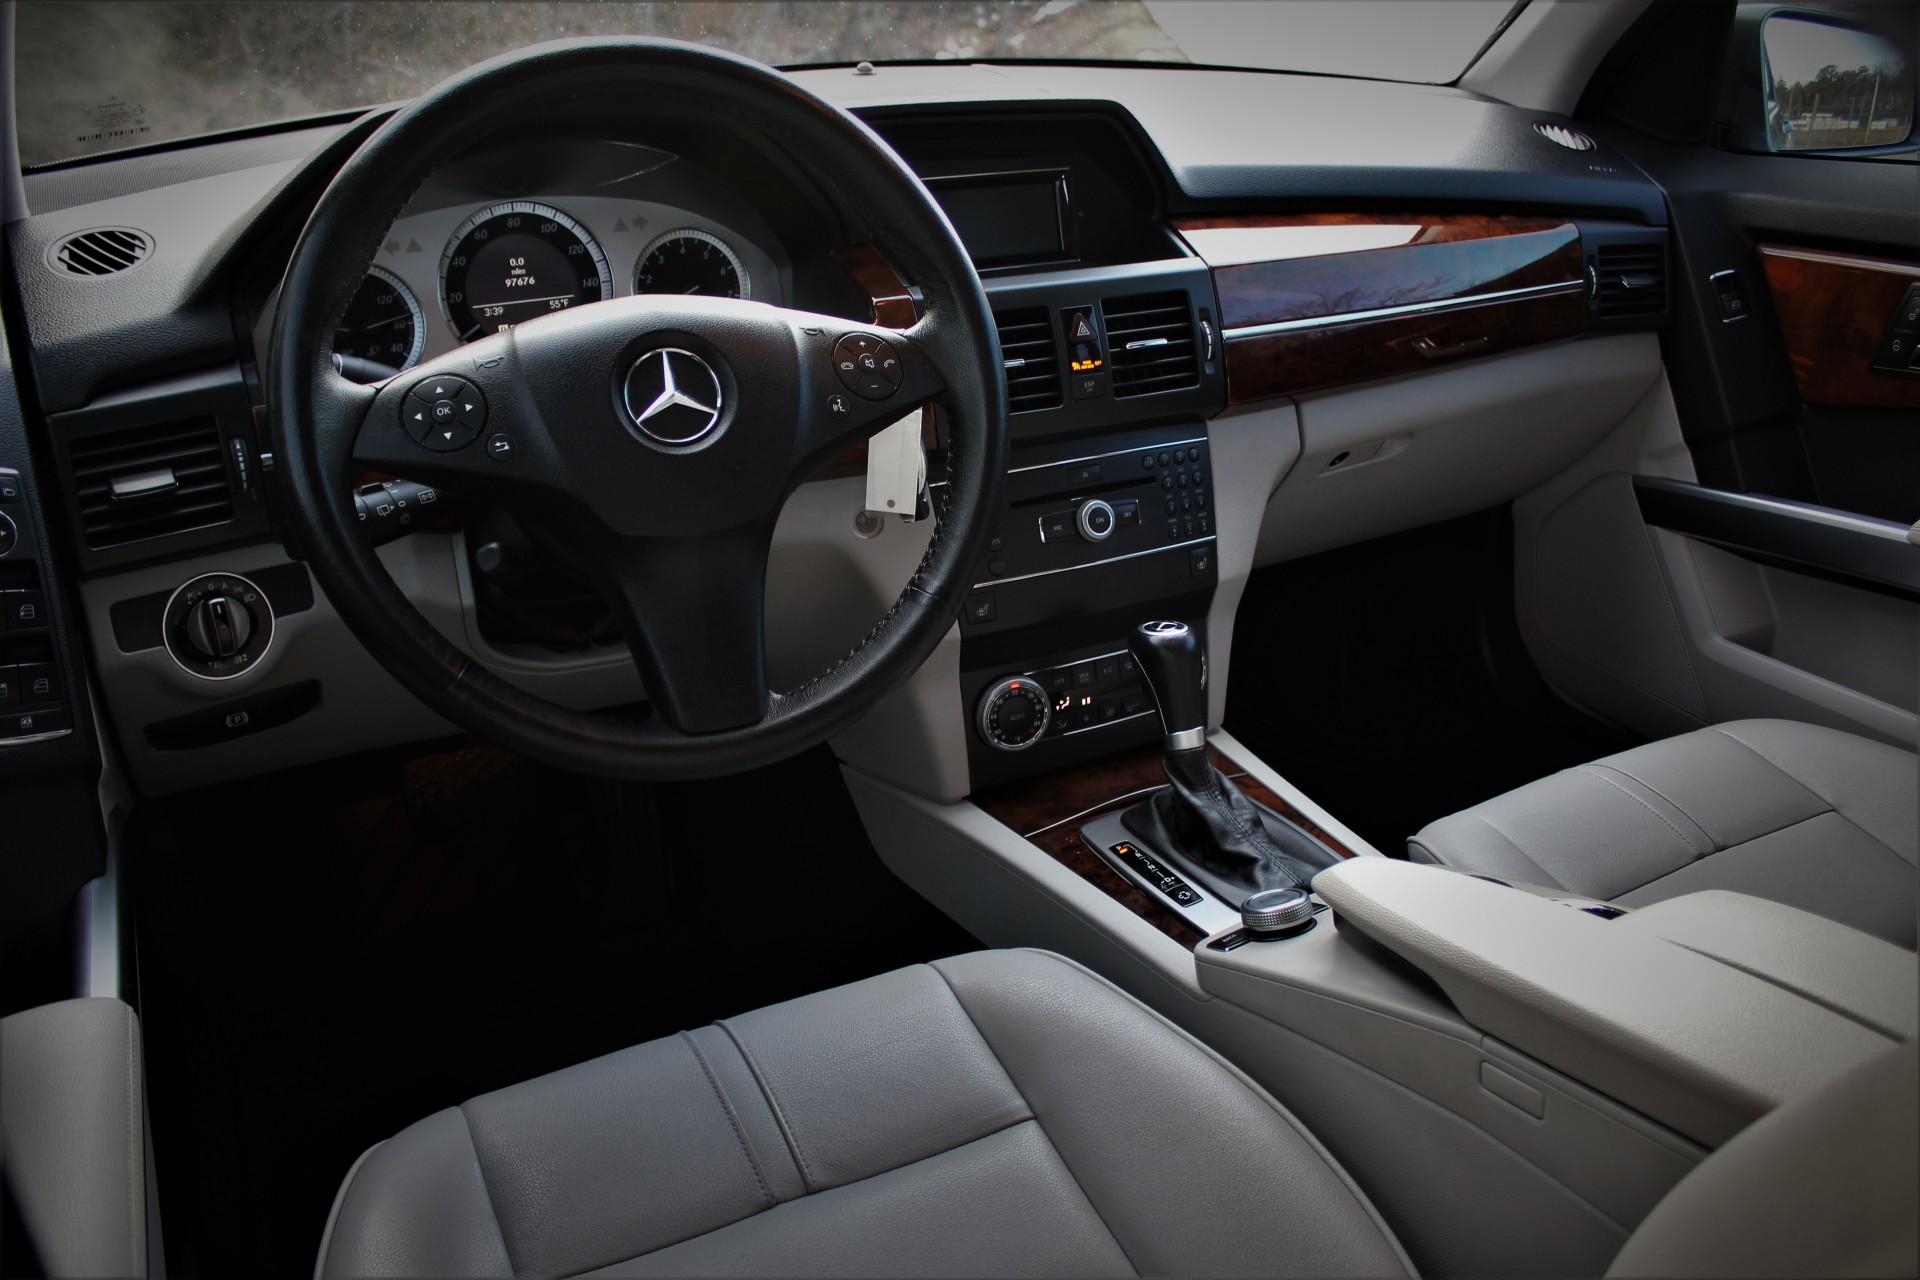 2010 Mercedes-Benz GLK350